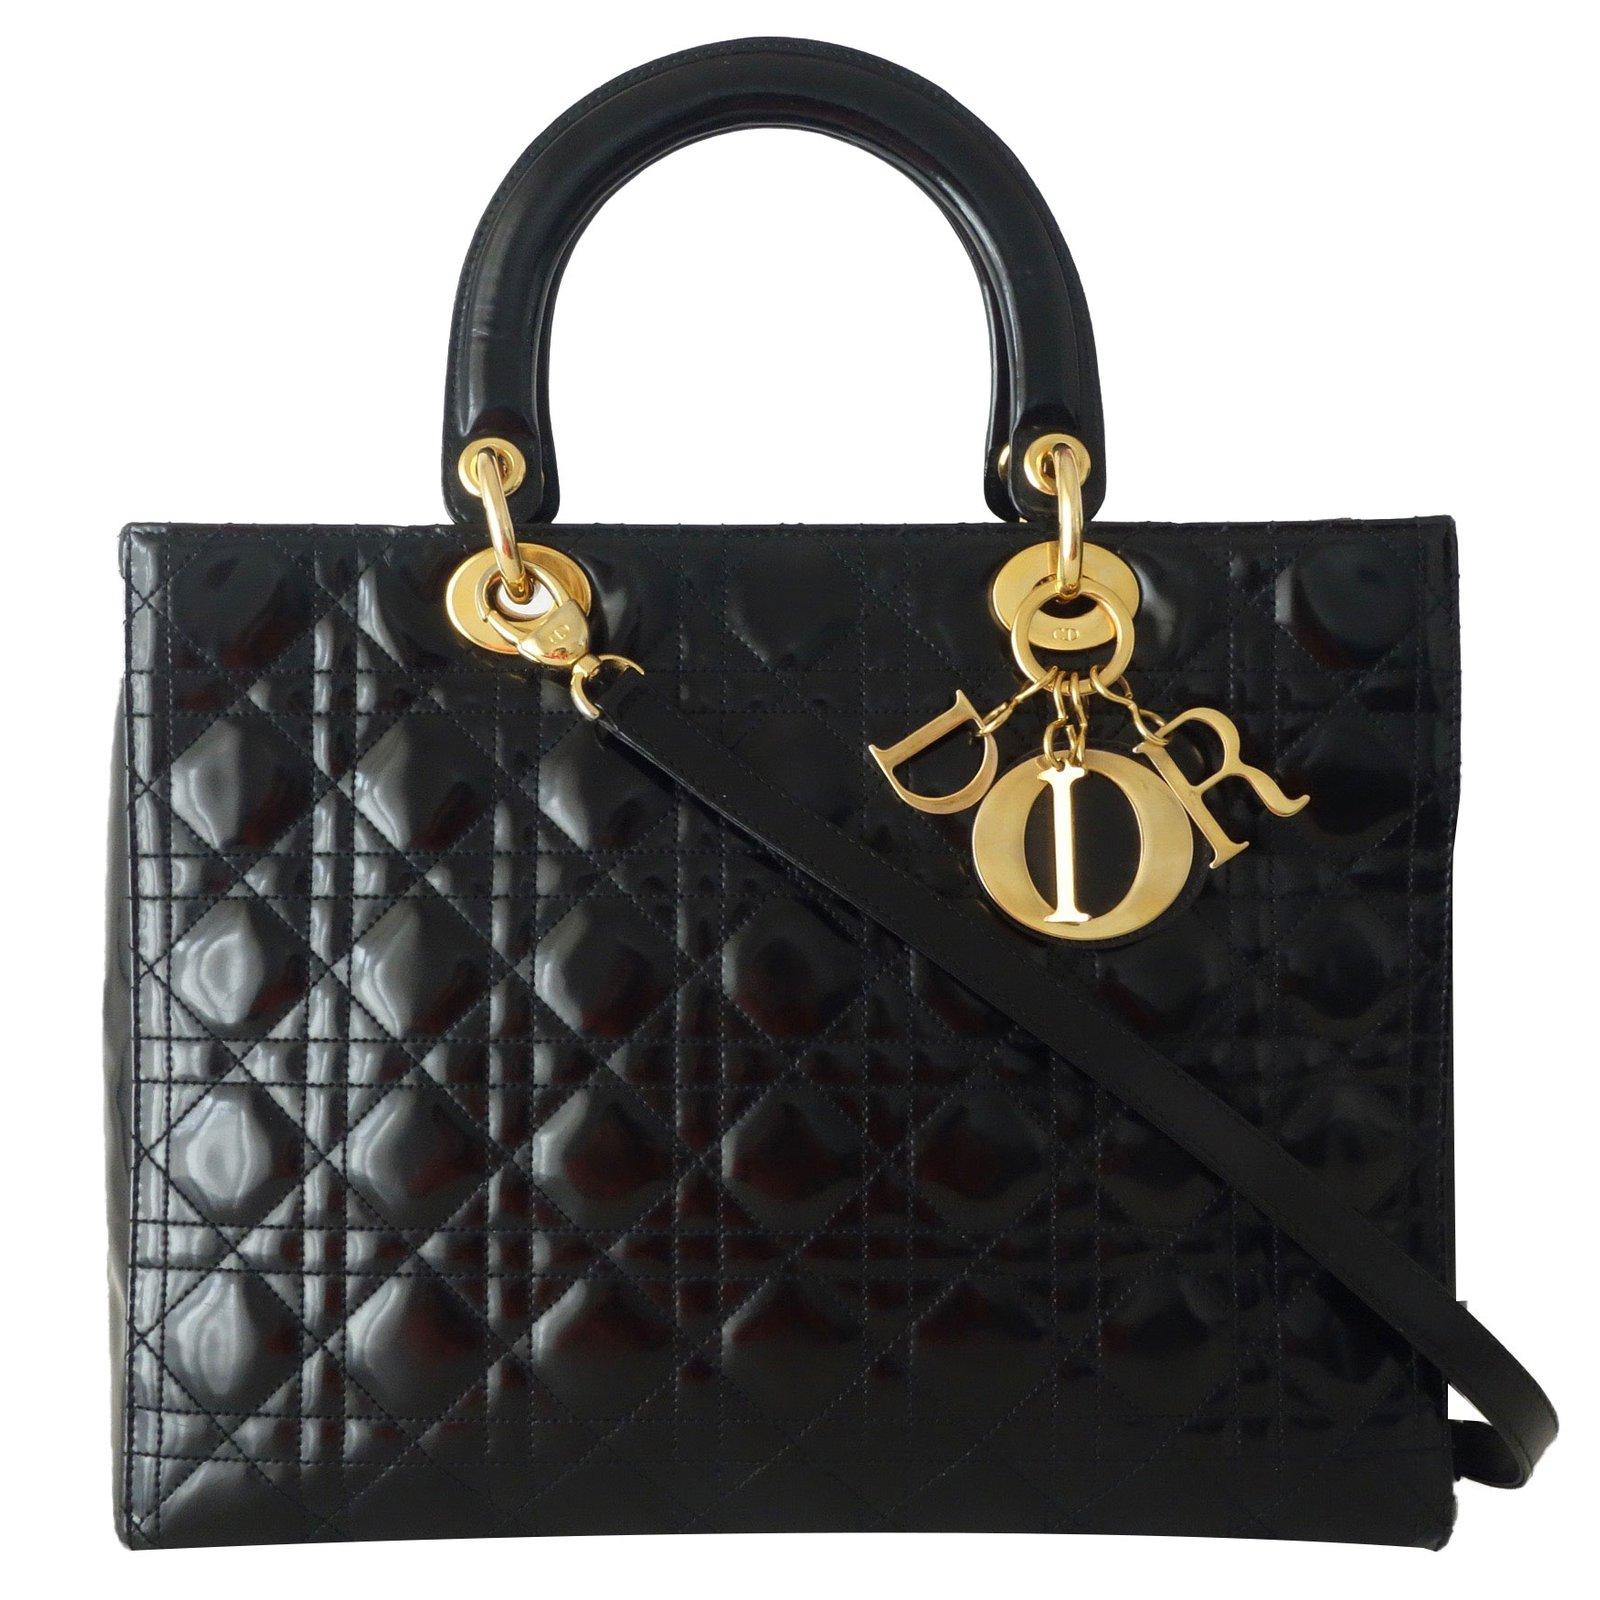 6d15204d376 Sacs à main Dior SAC LADY DIOR GRAND MODELE NOIR Cuir vernis Noir ref.50971